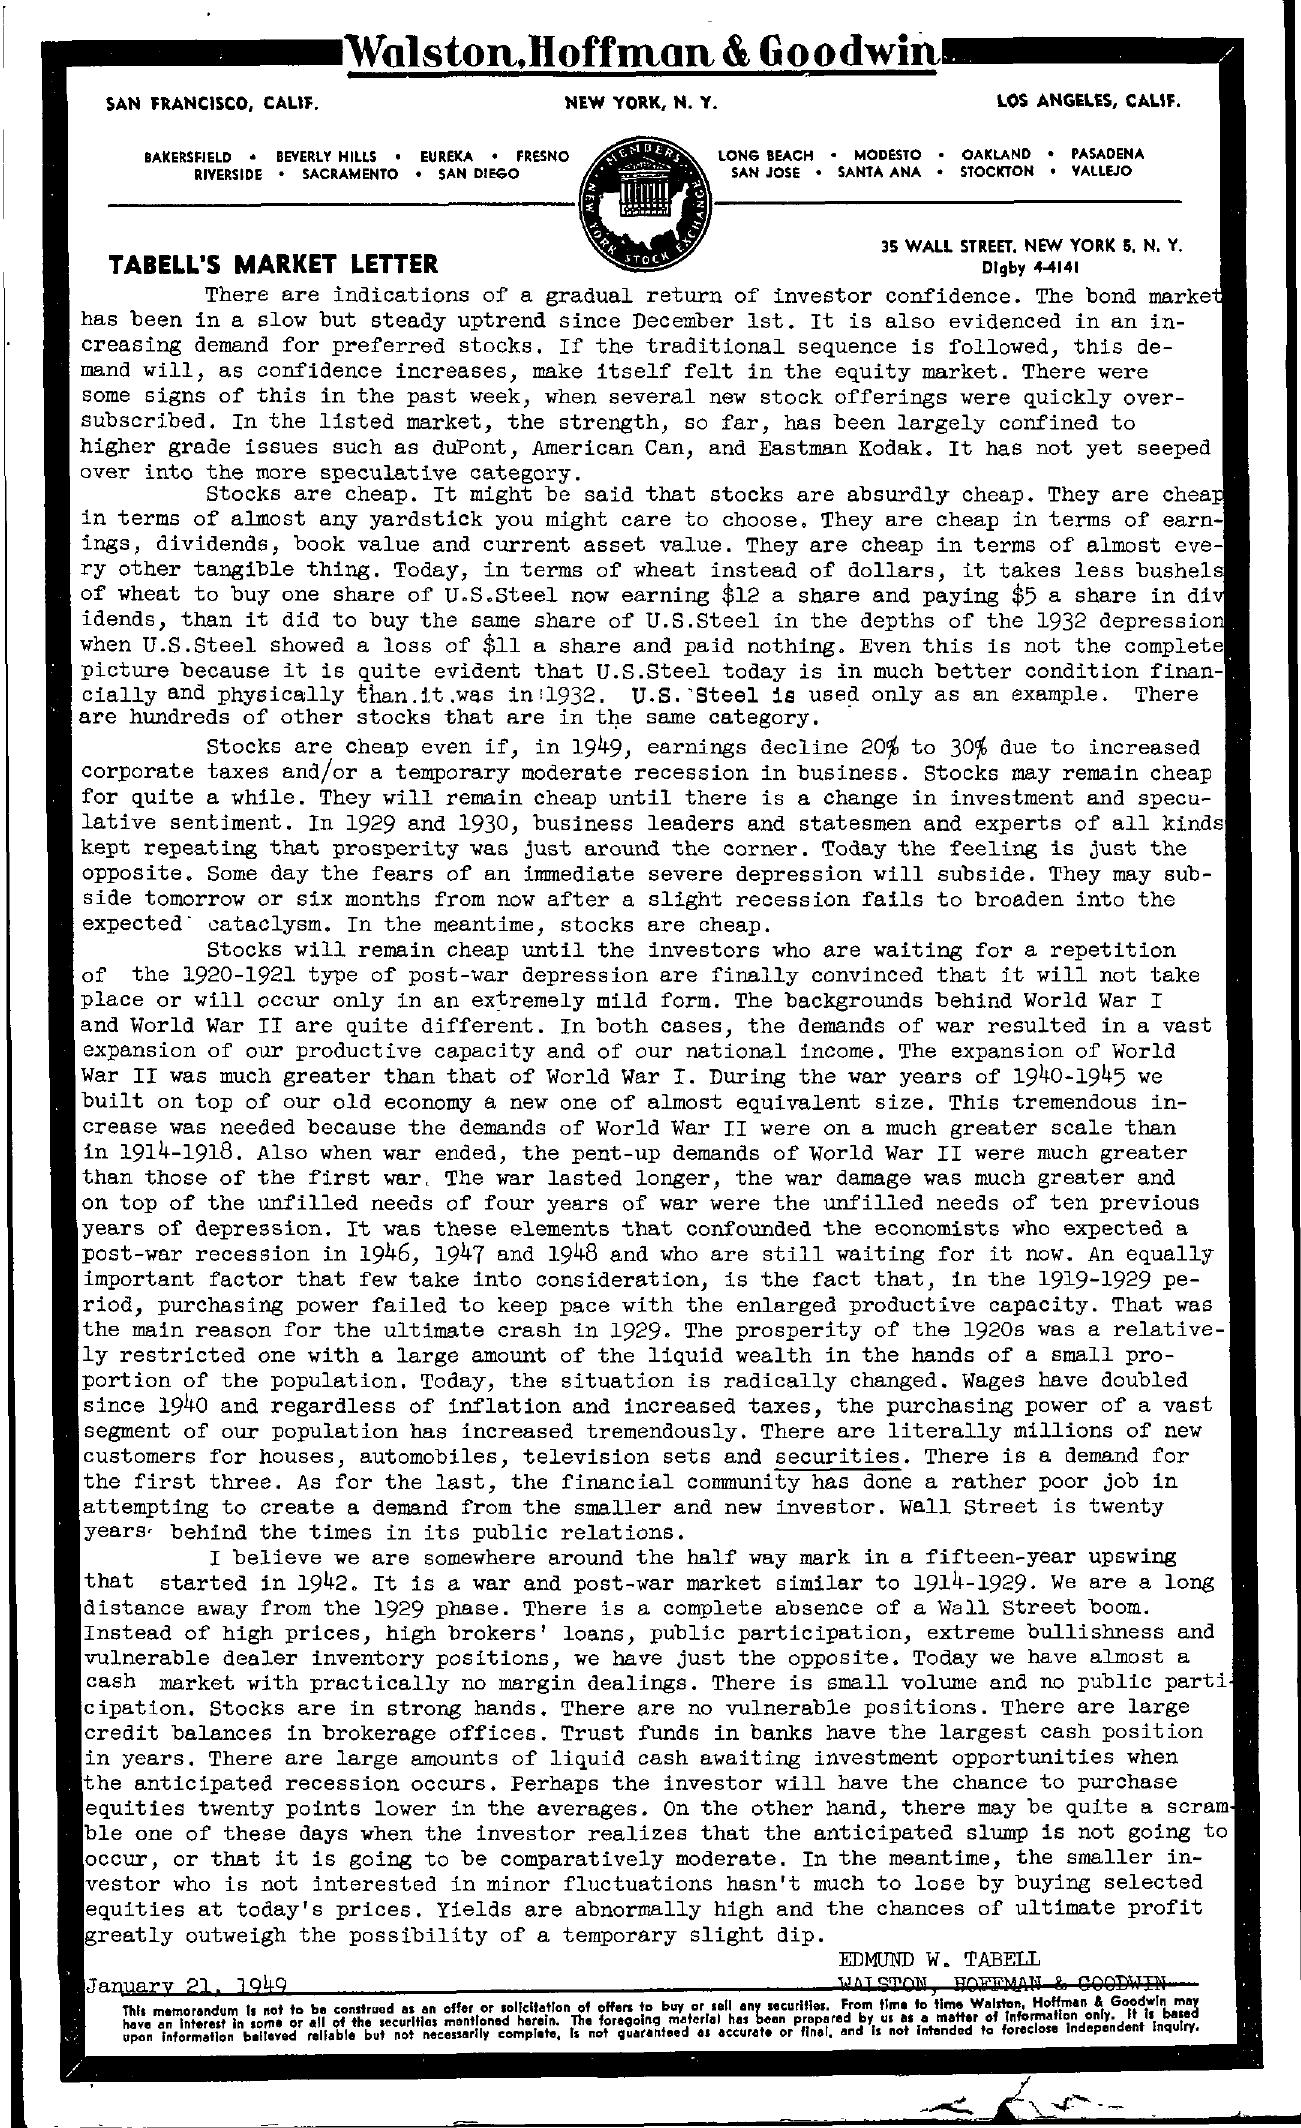 Tabell's Market Letter - January 21, 1949